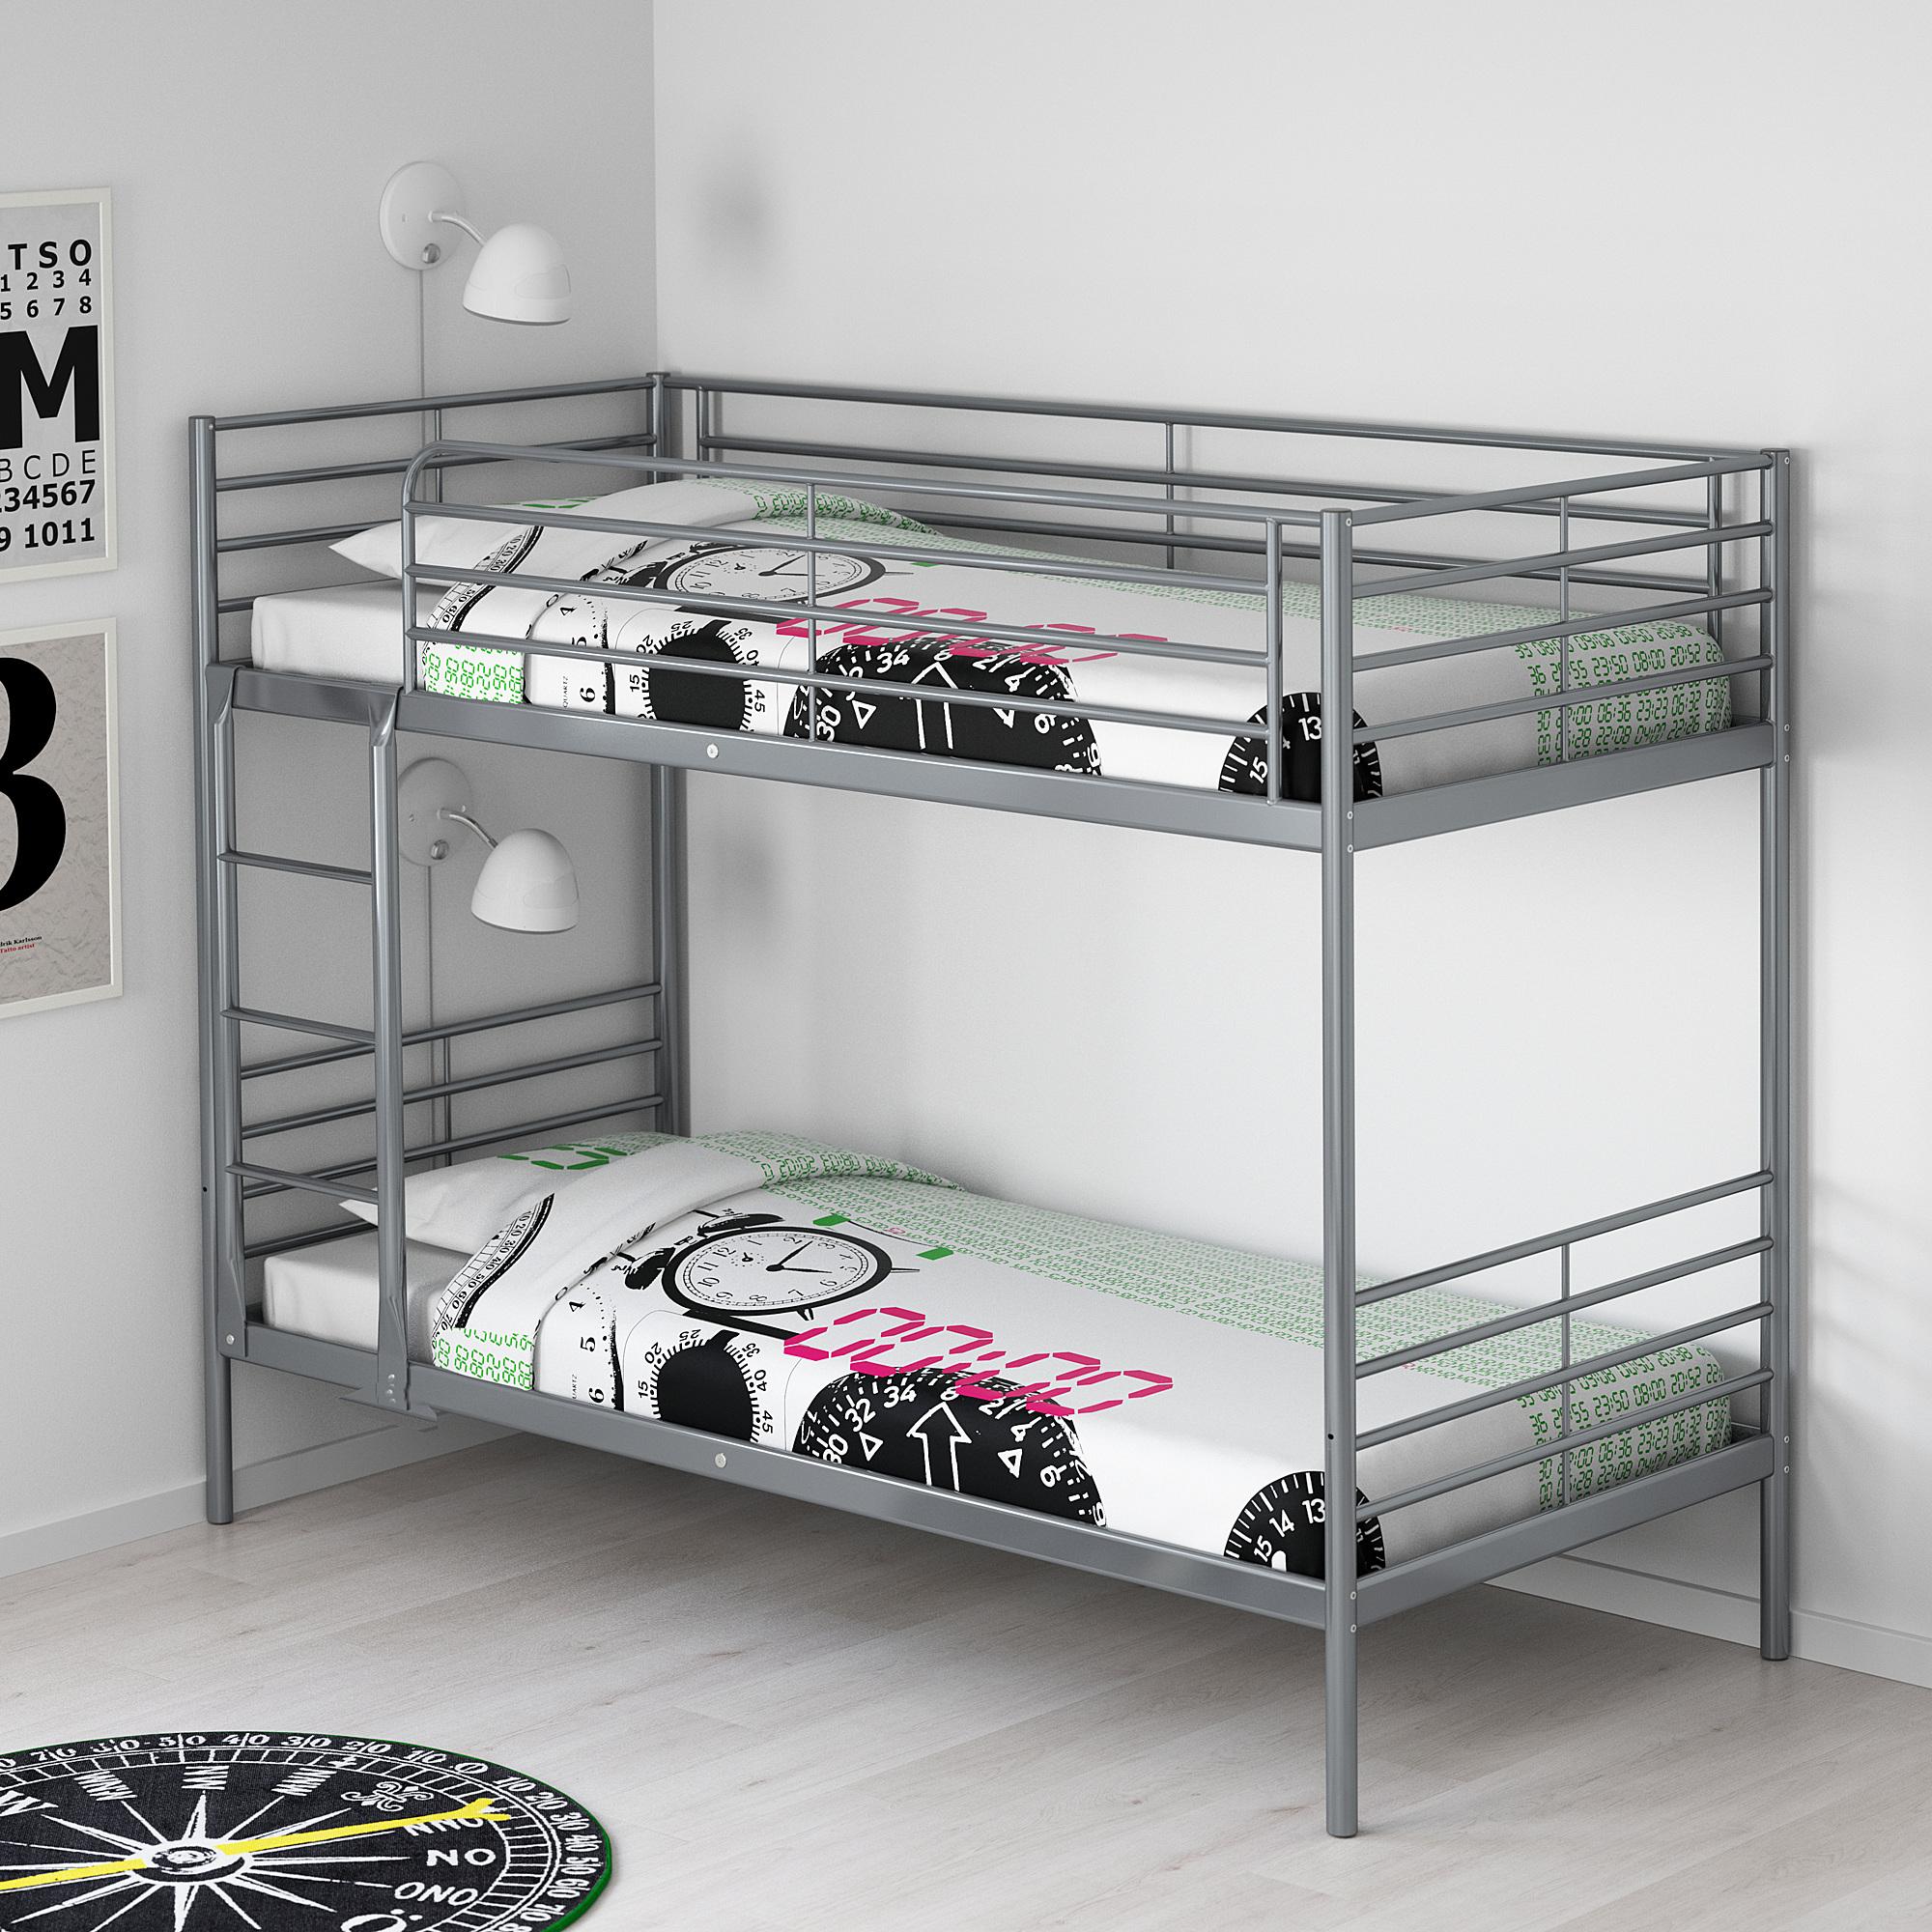 Ikea Estonia Shop For Furniture Lighting Home Accessories More